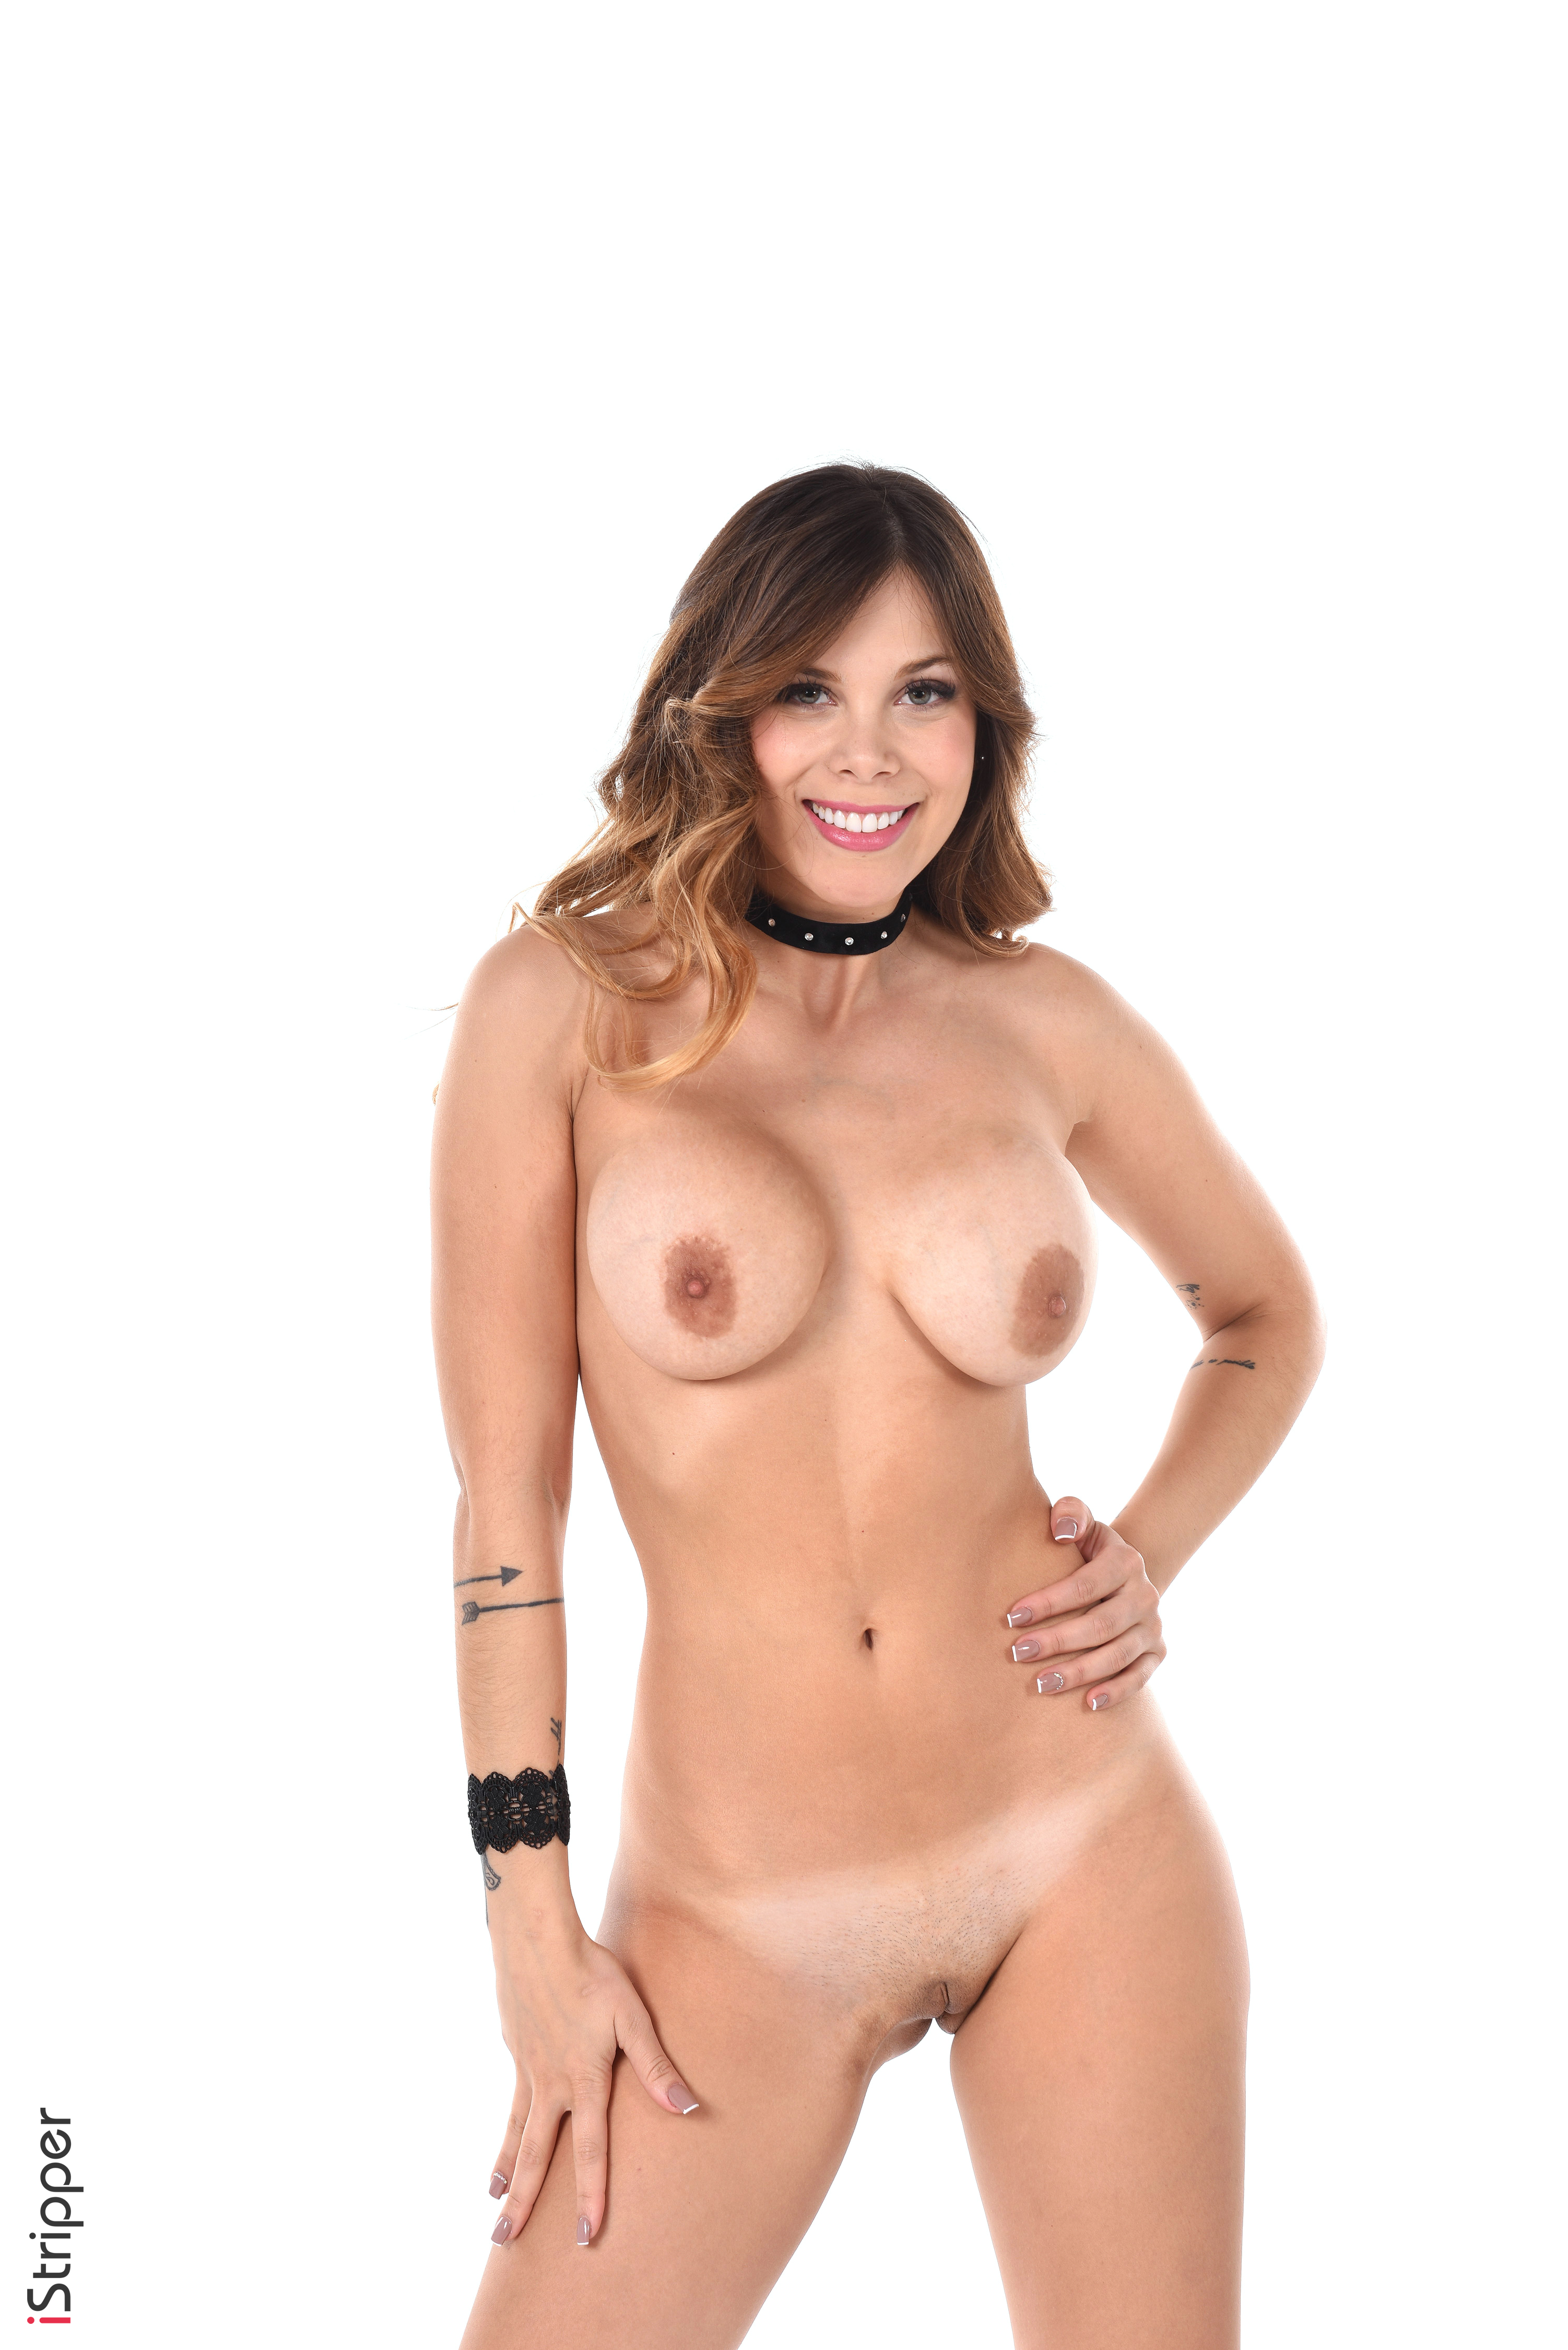 hd lingerie wallpaper